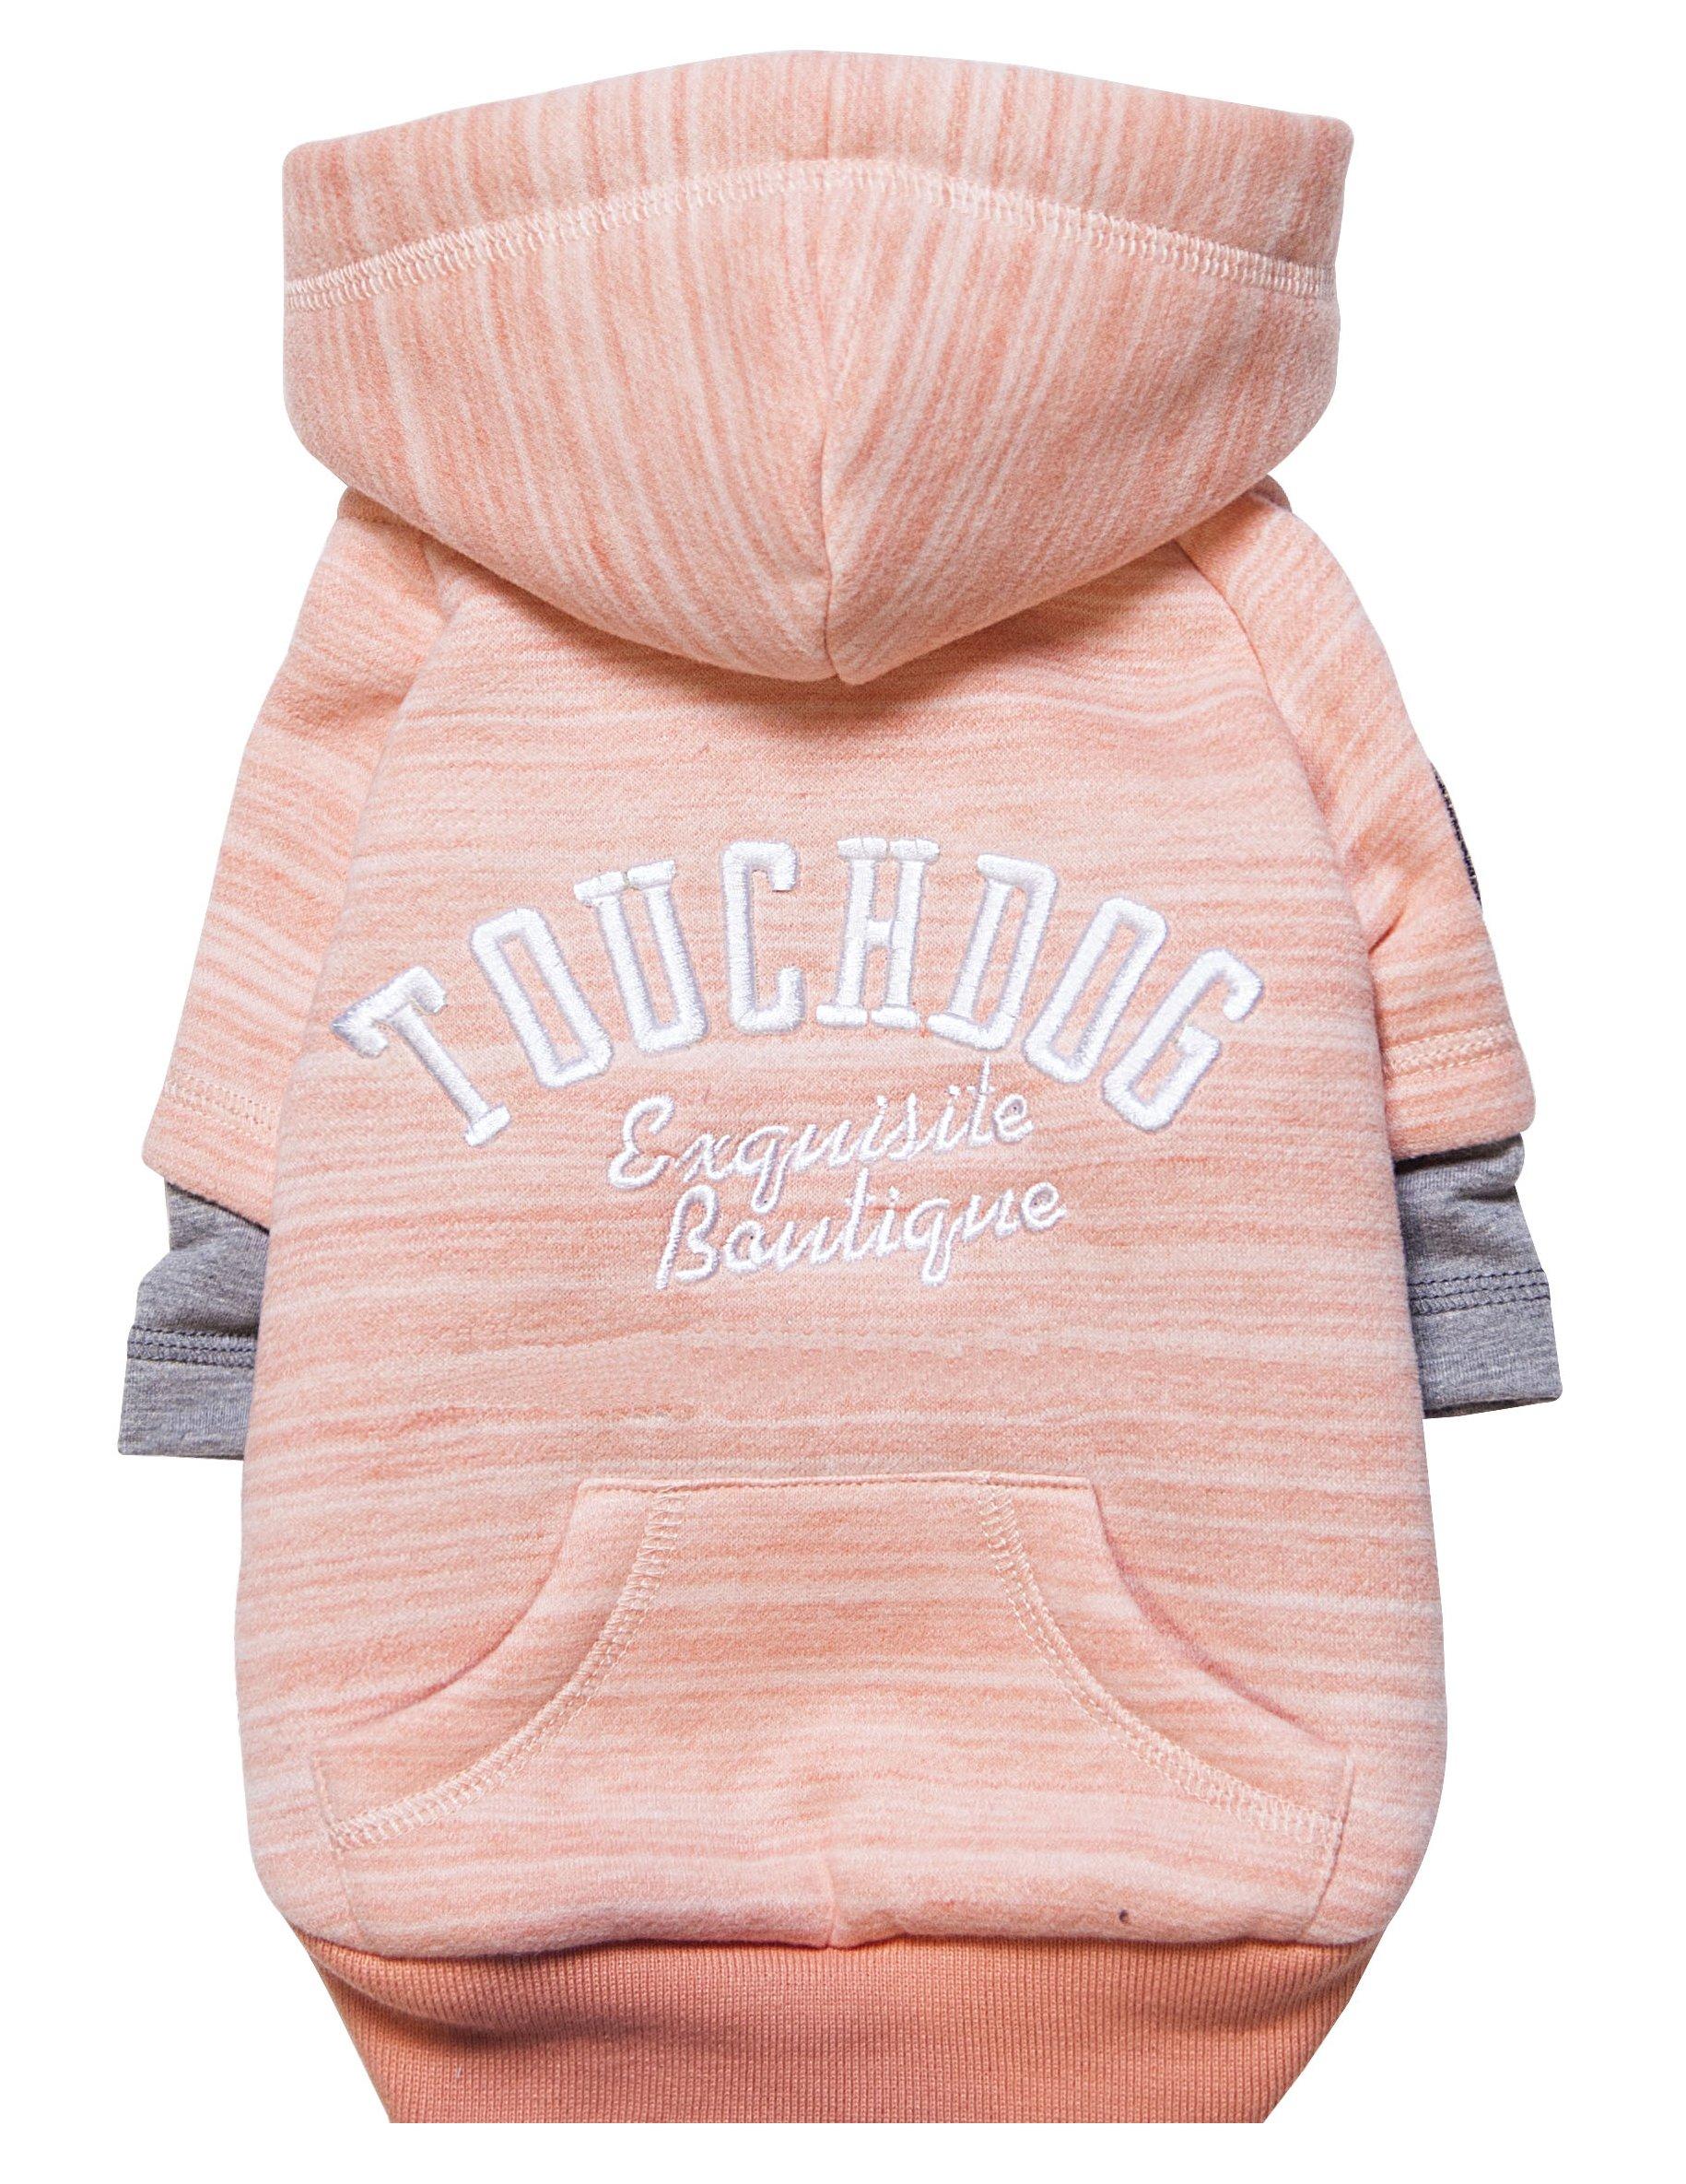 touchdog Hampton Beach' Designer Fashion Ultra-Plush Sand Blasted Pet Dog Hooded Sweater Hoodie, Large, Pink